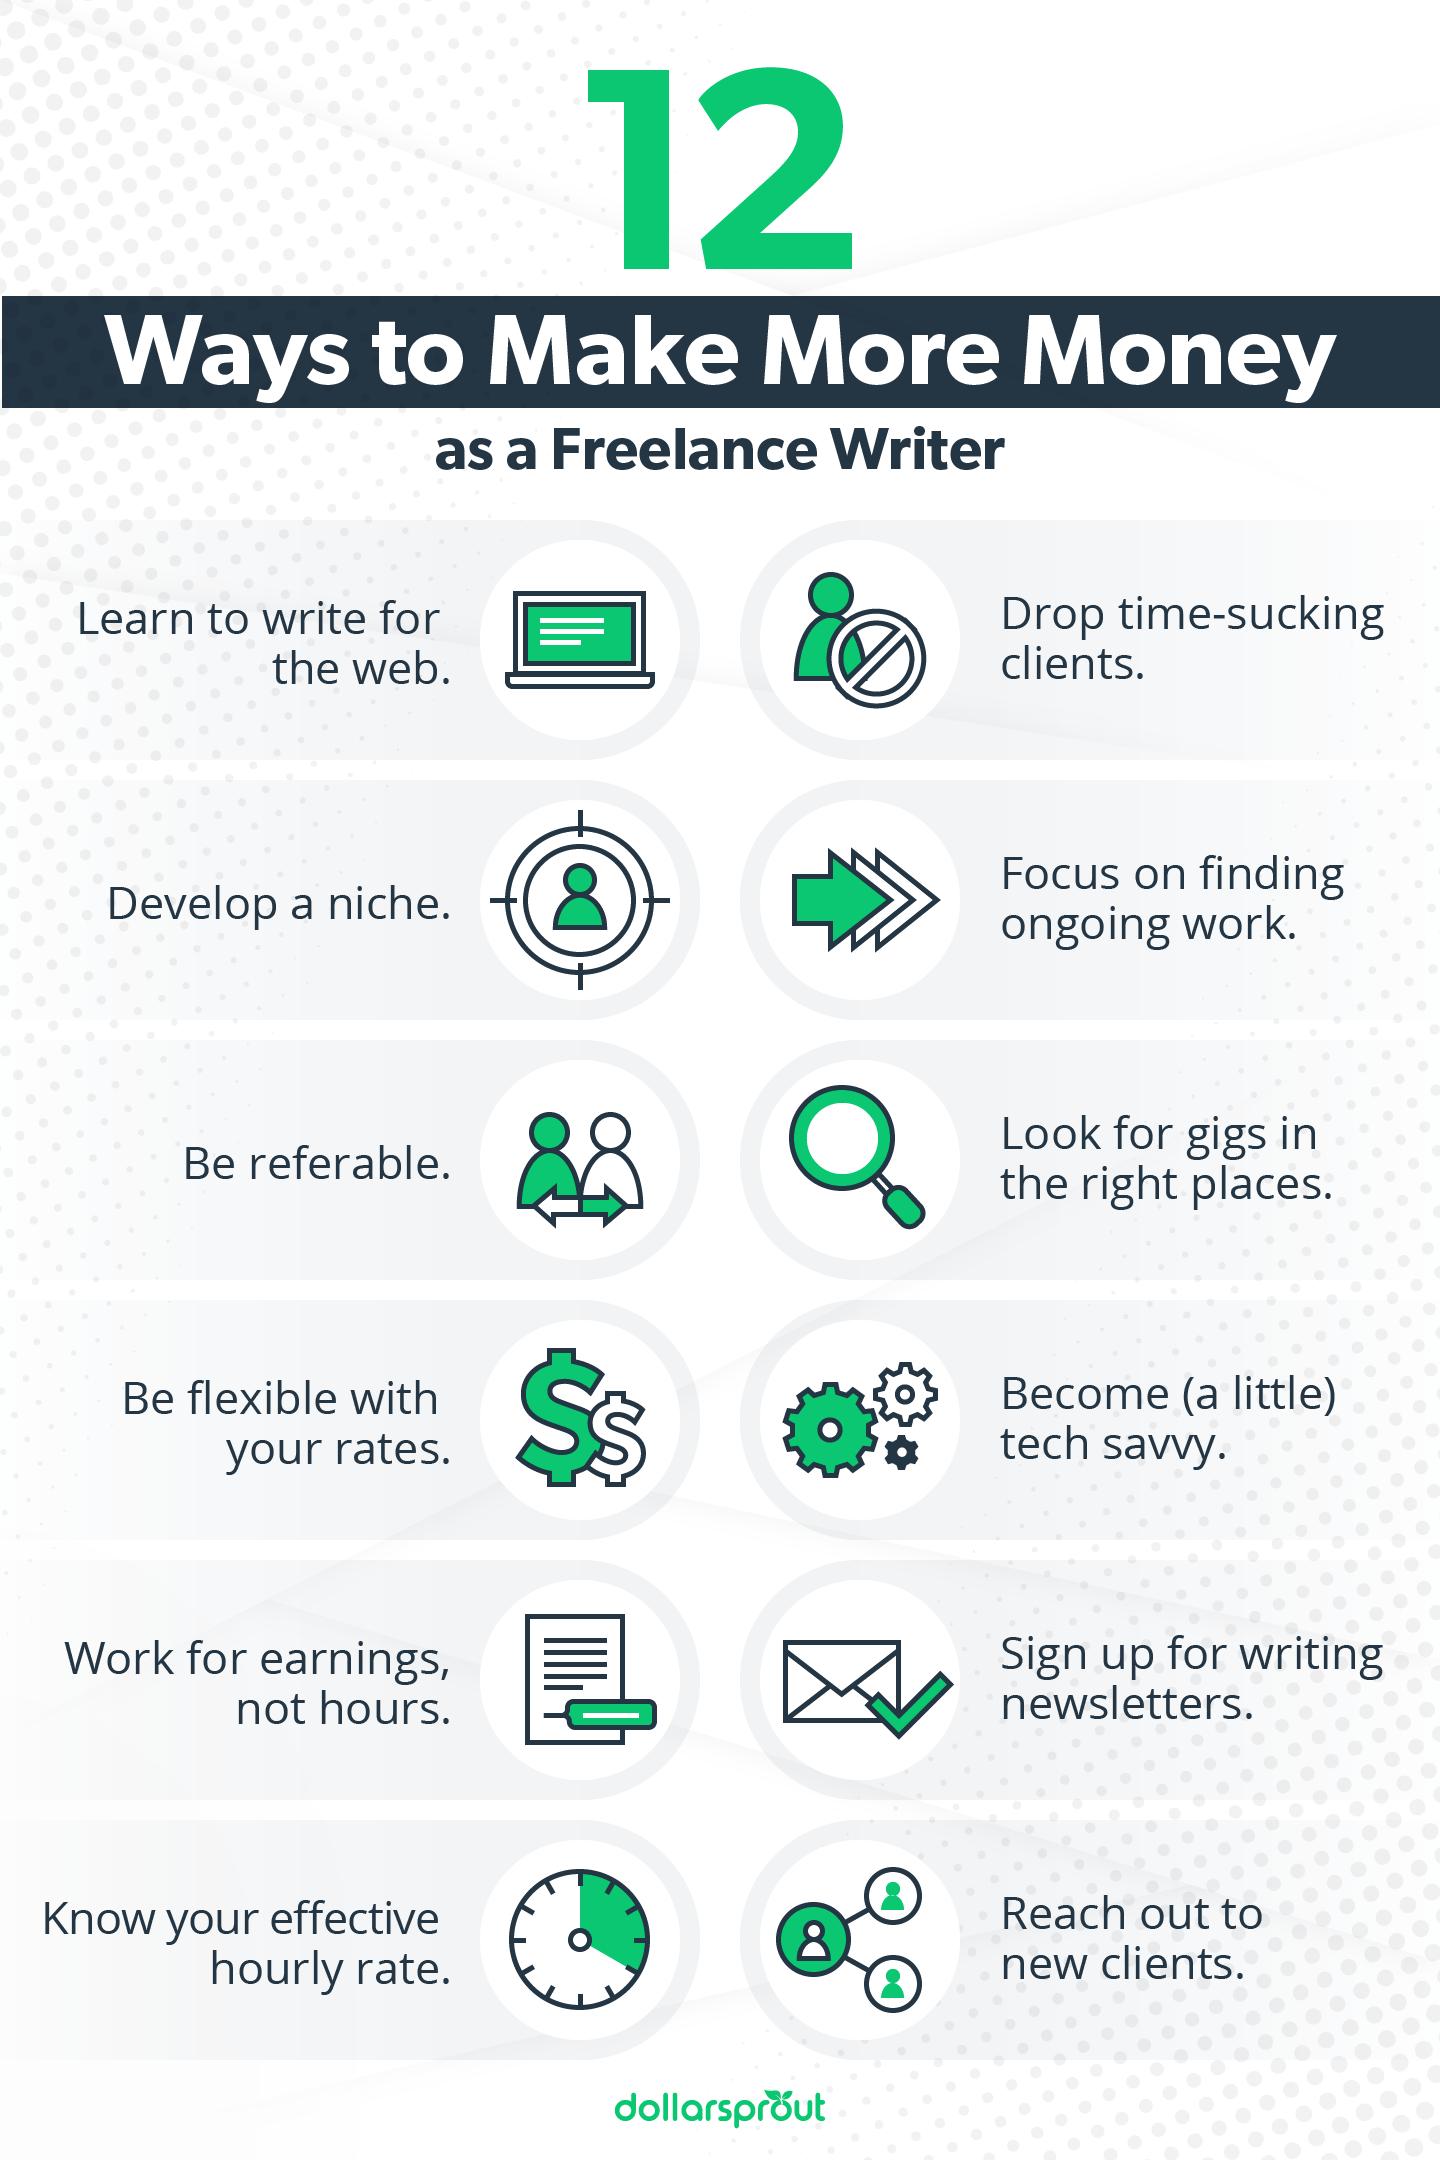 12 Ways to Make More Money as a Freelance Writer